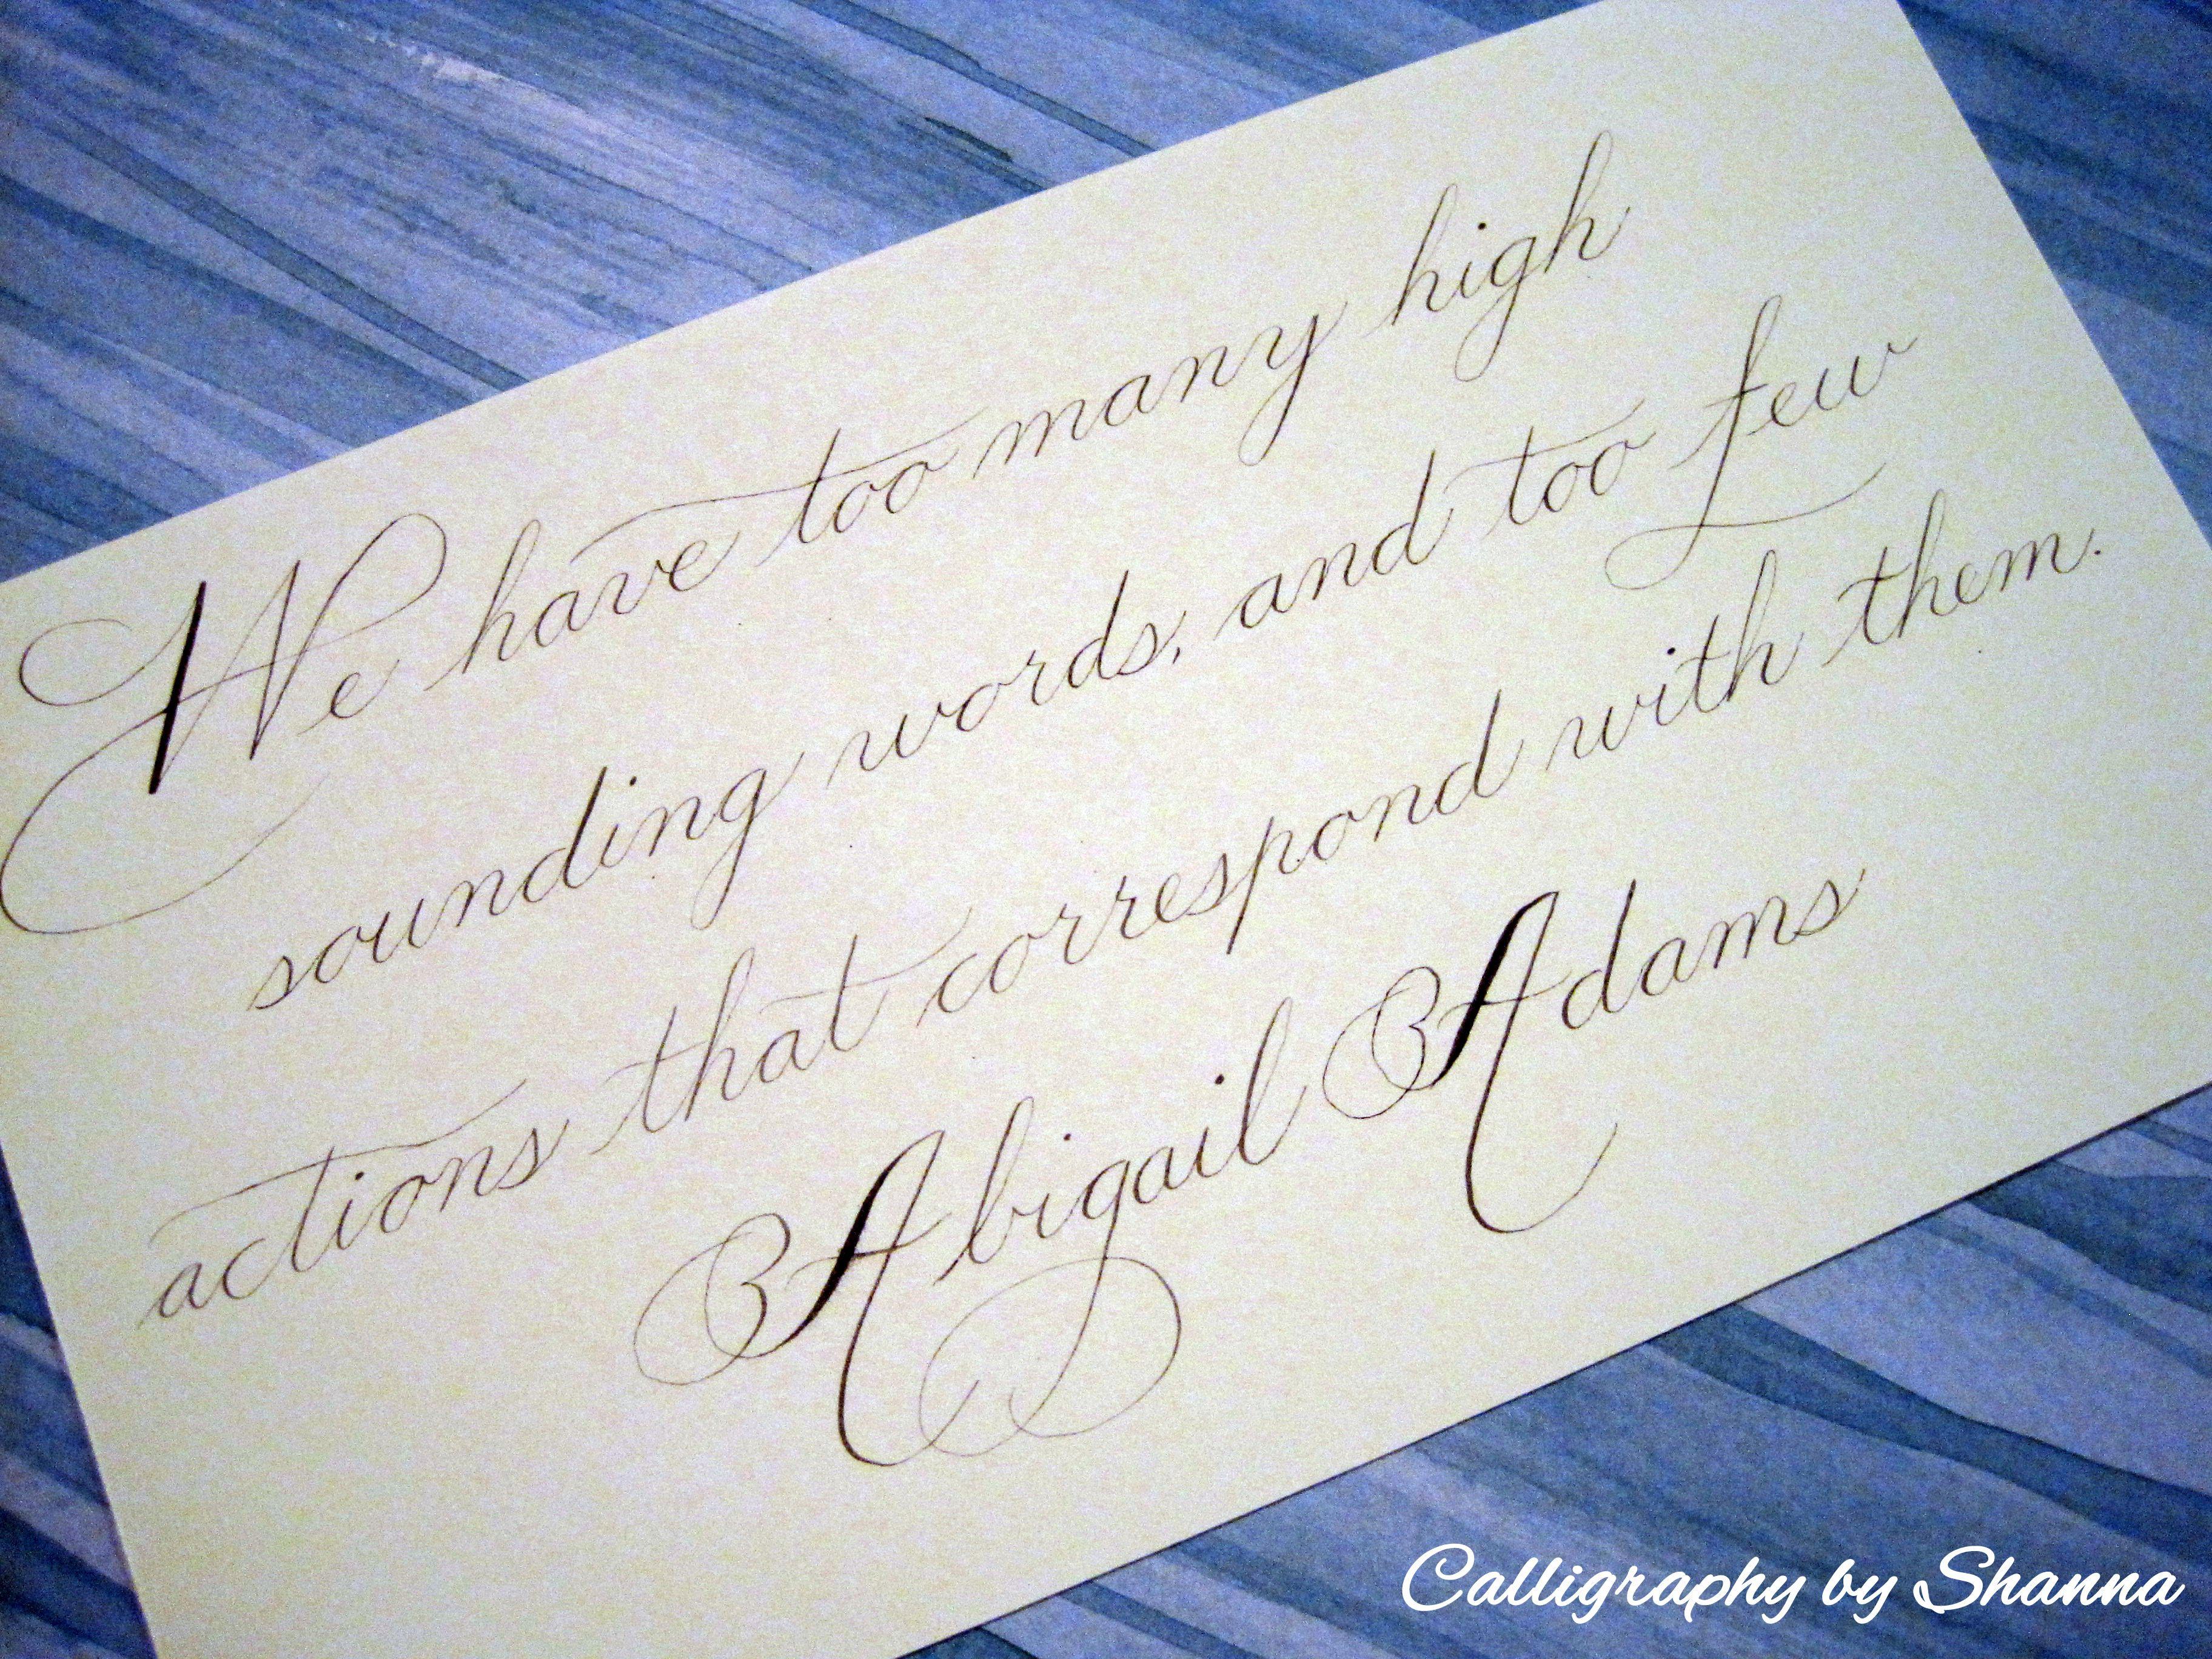 Abigail Adams Quotes Abigail Adams Quote Written In Spencerian  Flourished Script